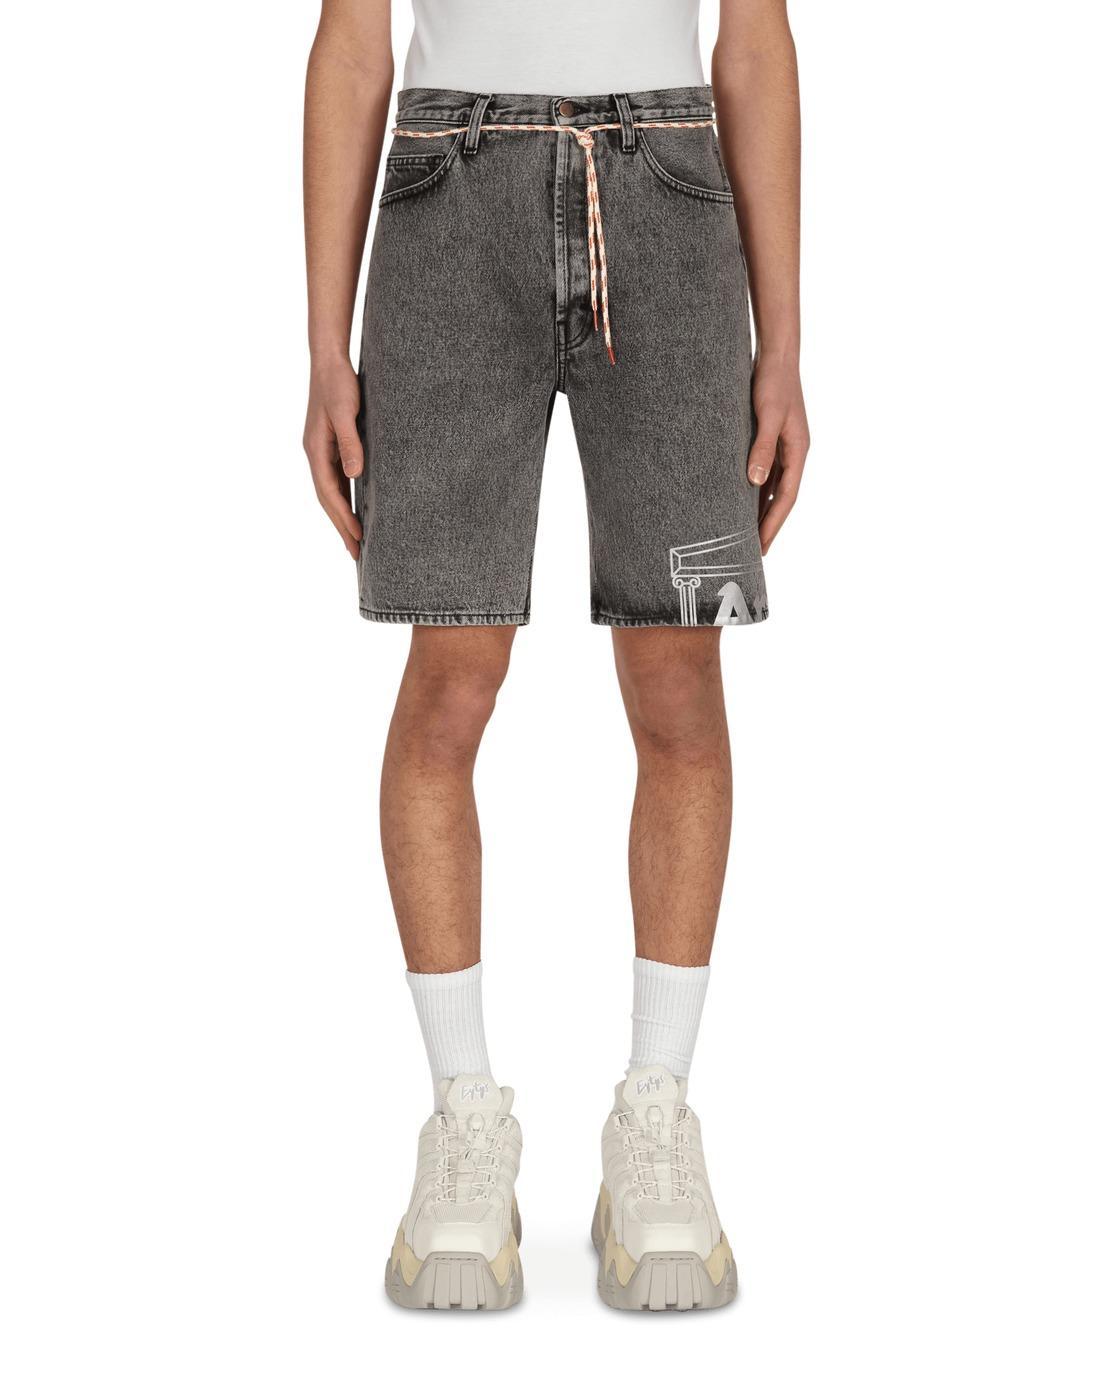 Aries Temple Acid Wash Denim Shorts Grey